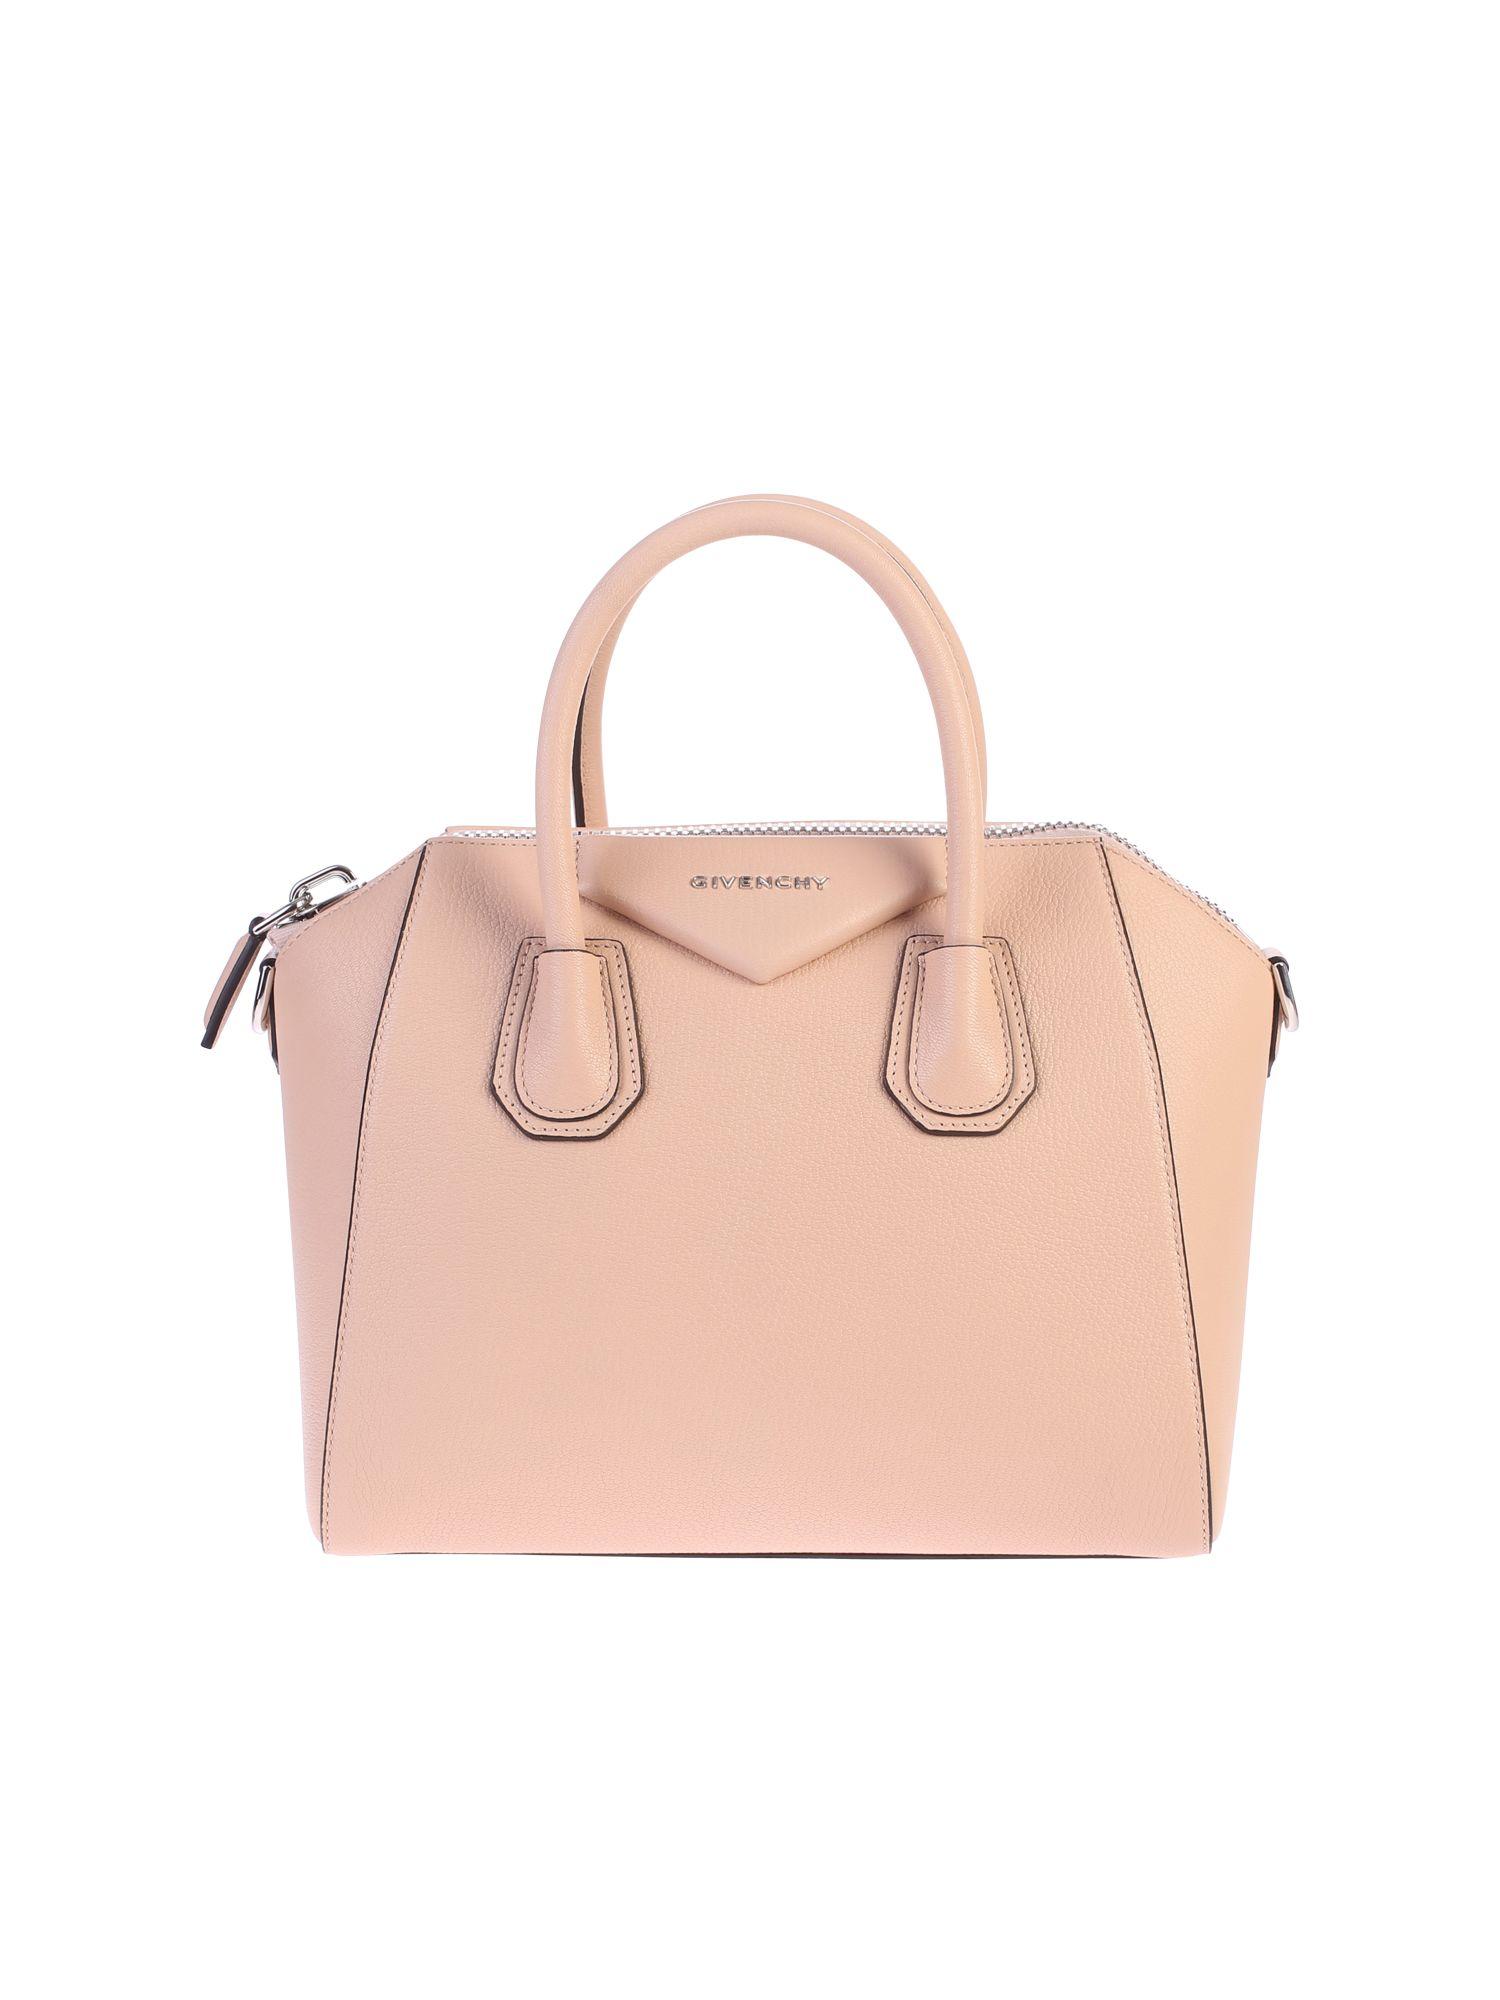 33c81cdcb5 GIVENCHY PINK SMALL ANTIGONA BAG